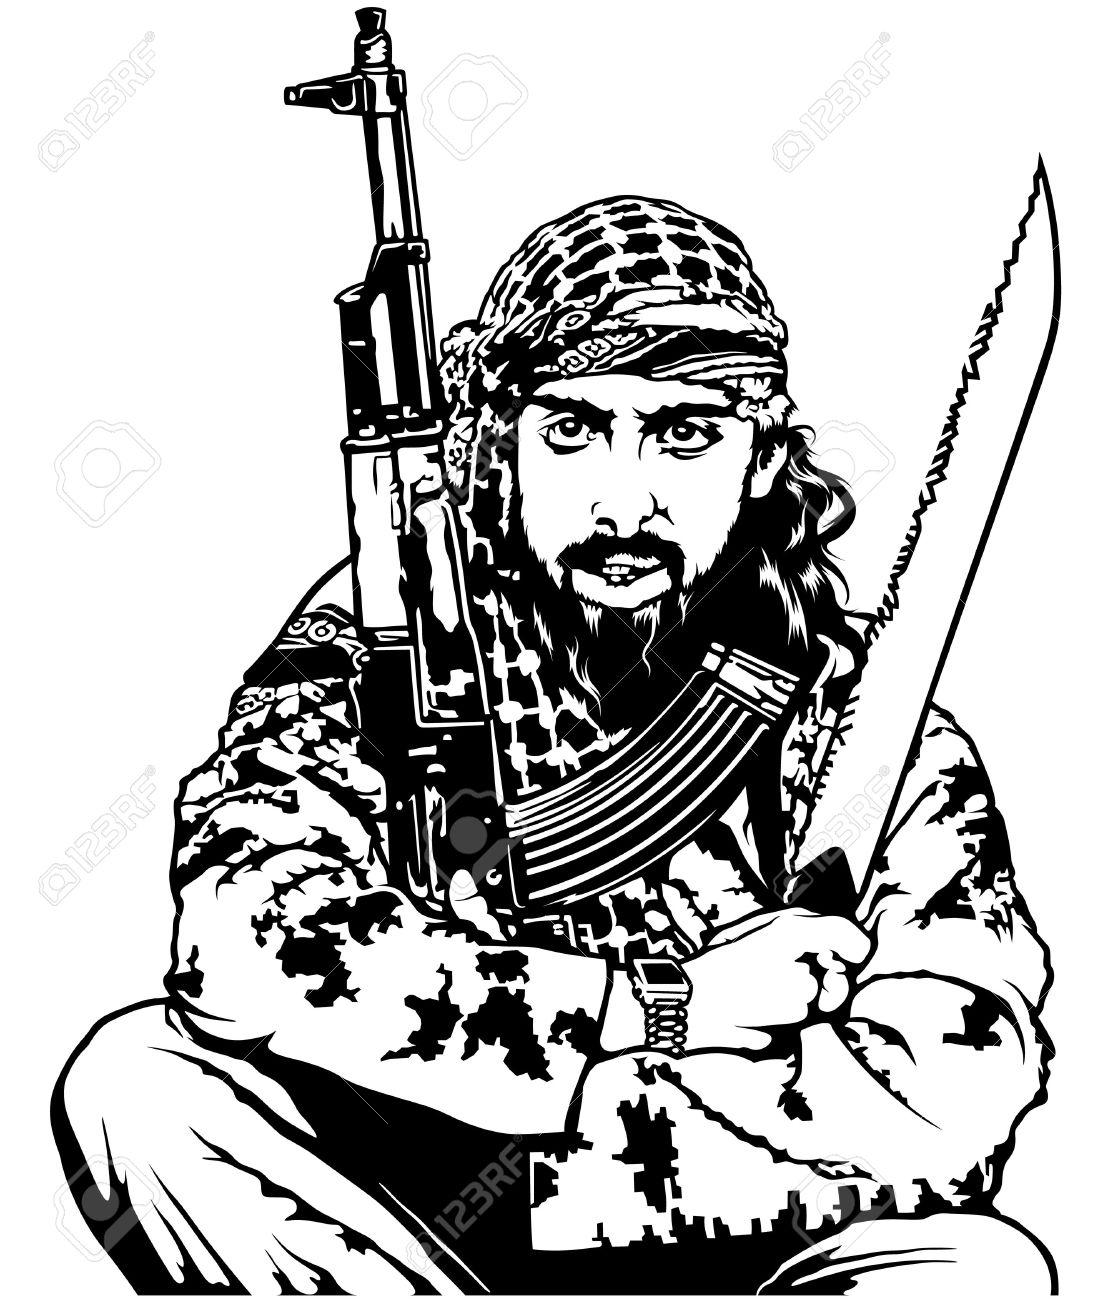 Terrorist clipart 7 » Clipart Station.